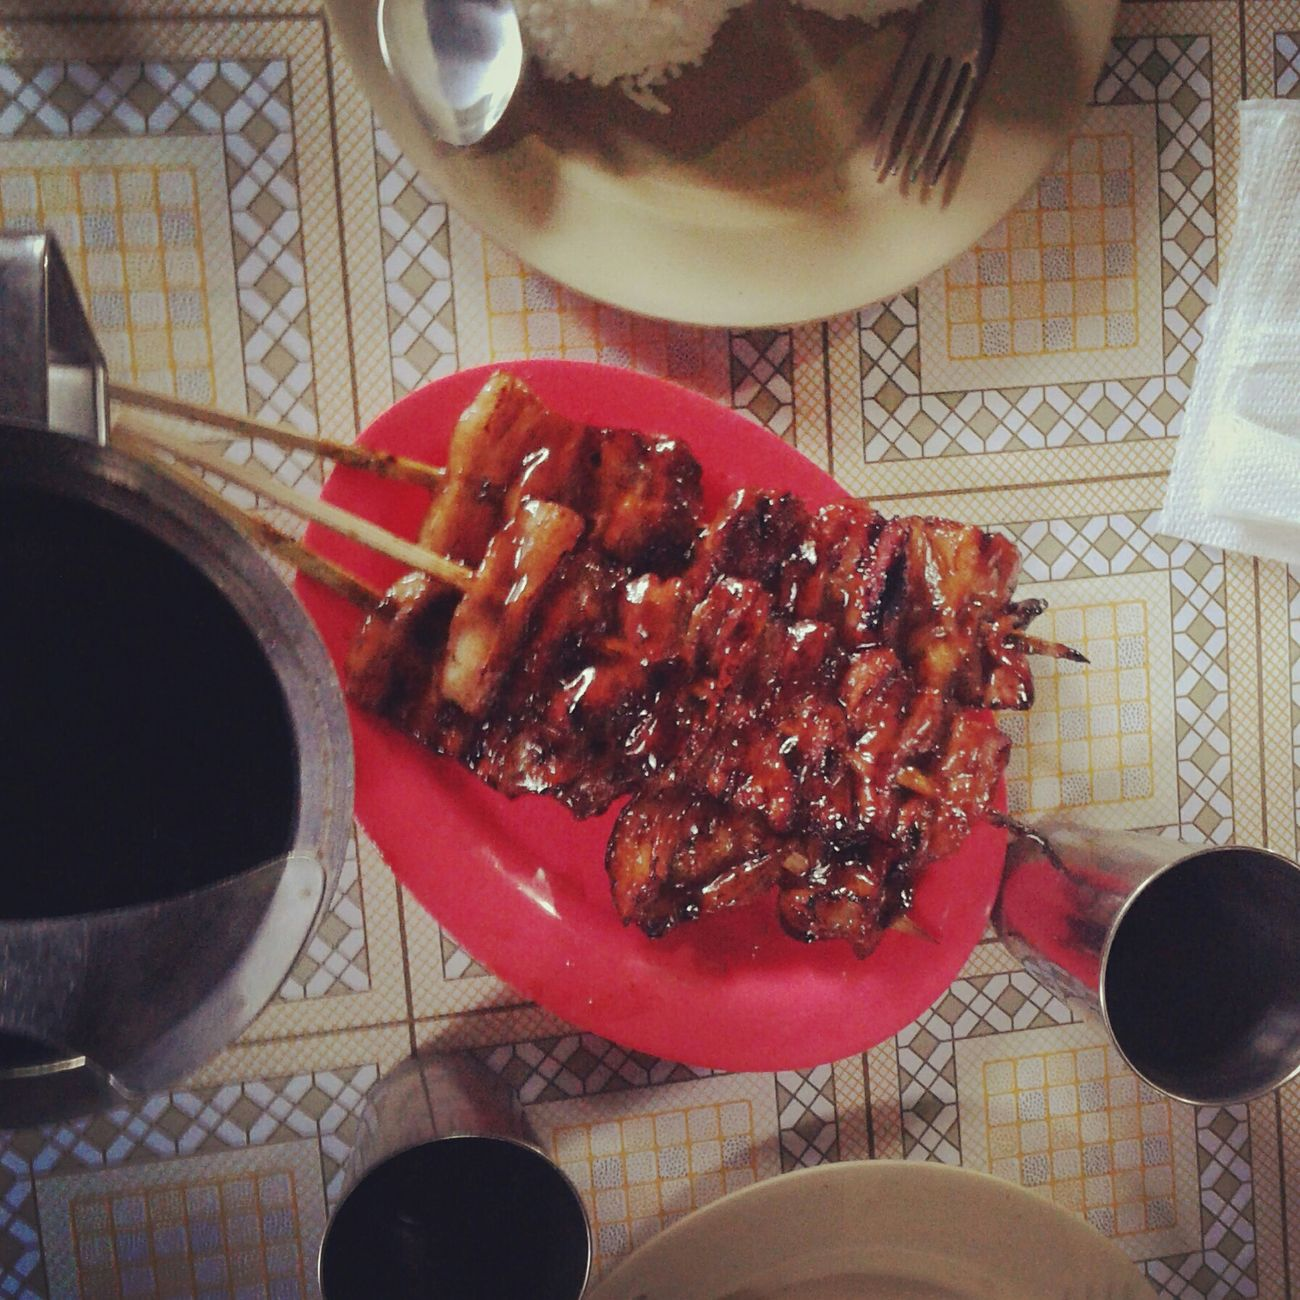 Mealtime Porkbarbecue